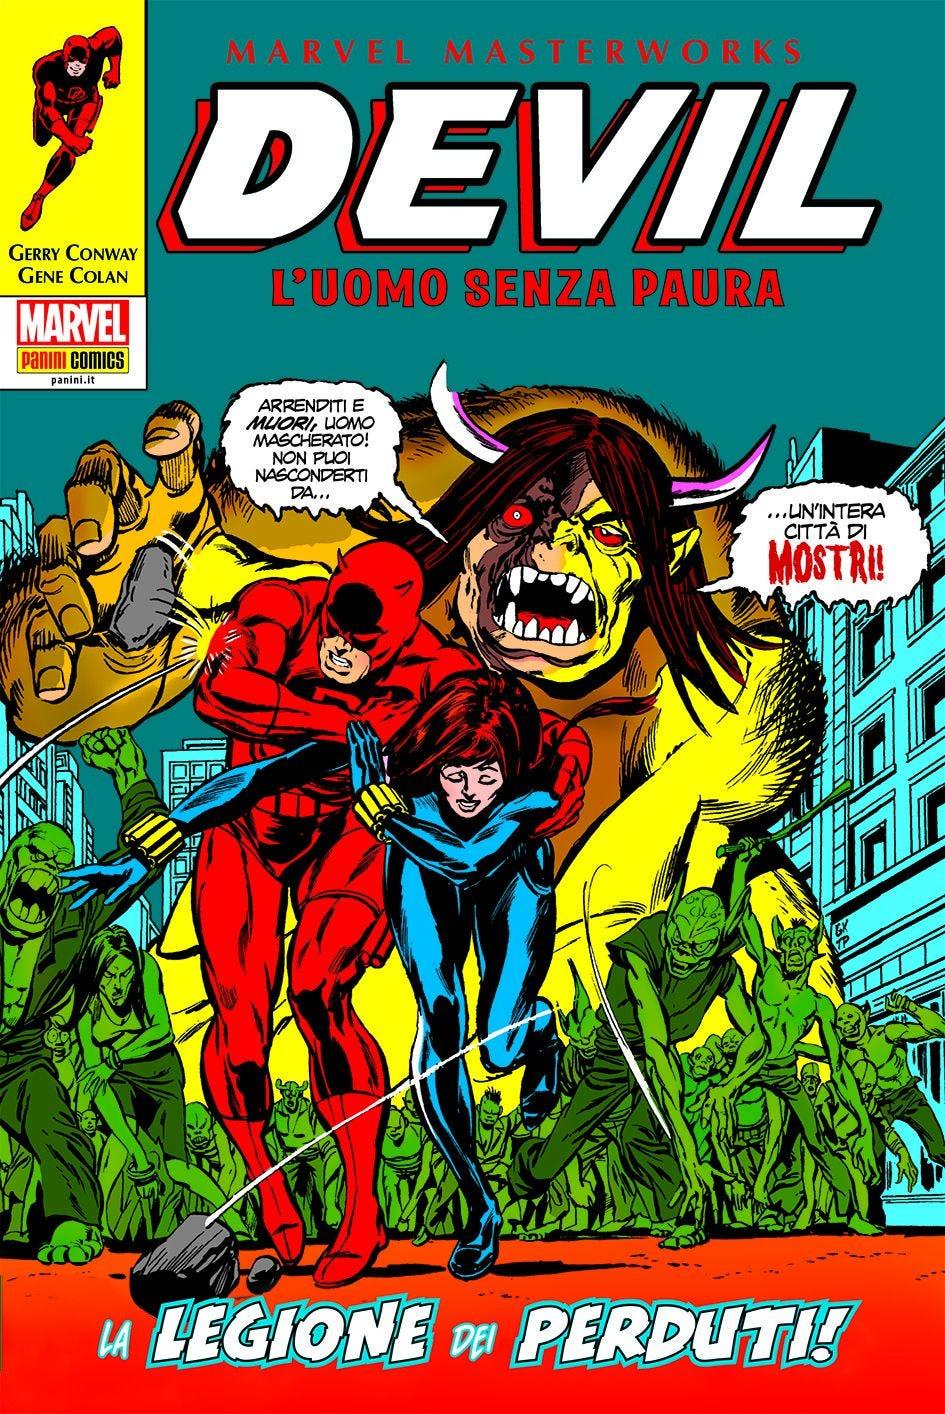 Marvel Masterworks: Devil 9 Prevendita magazines